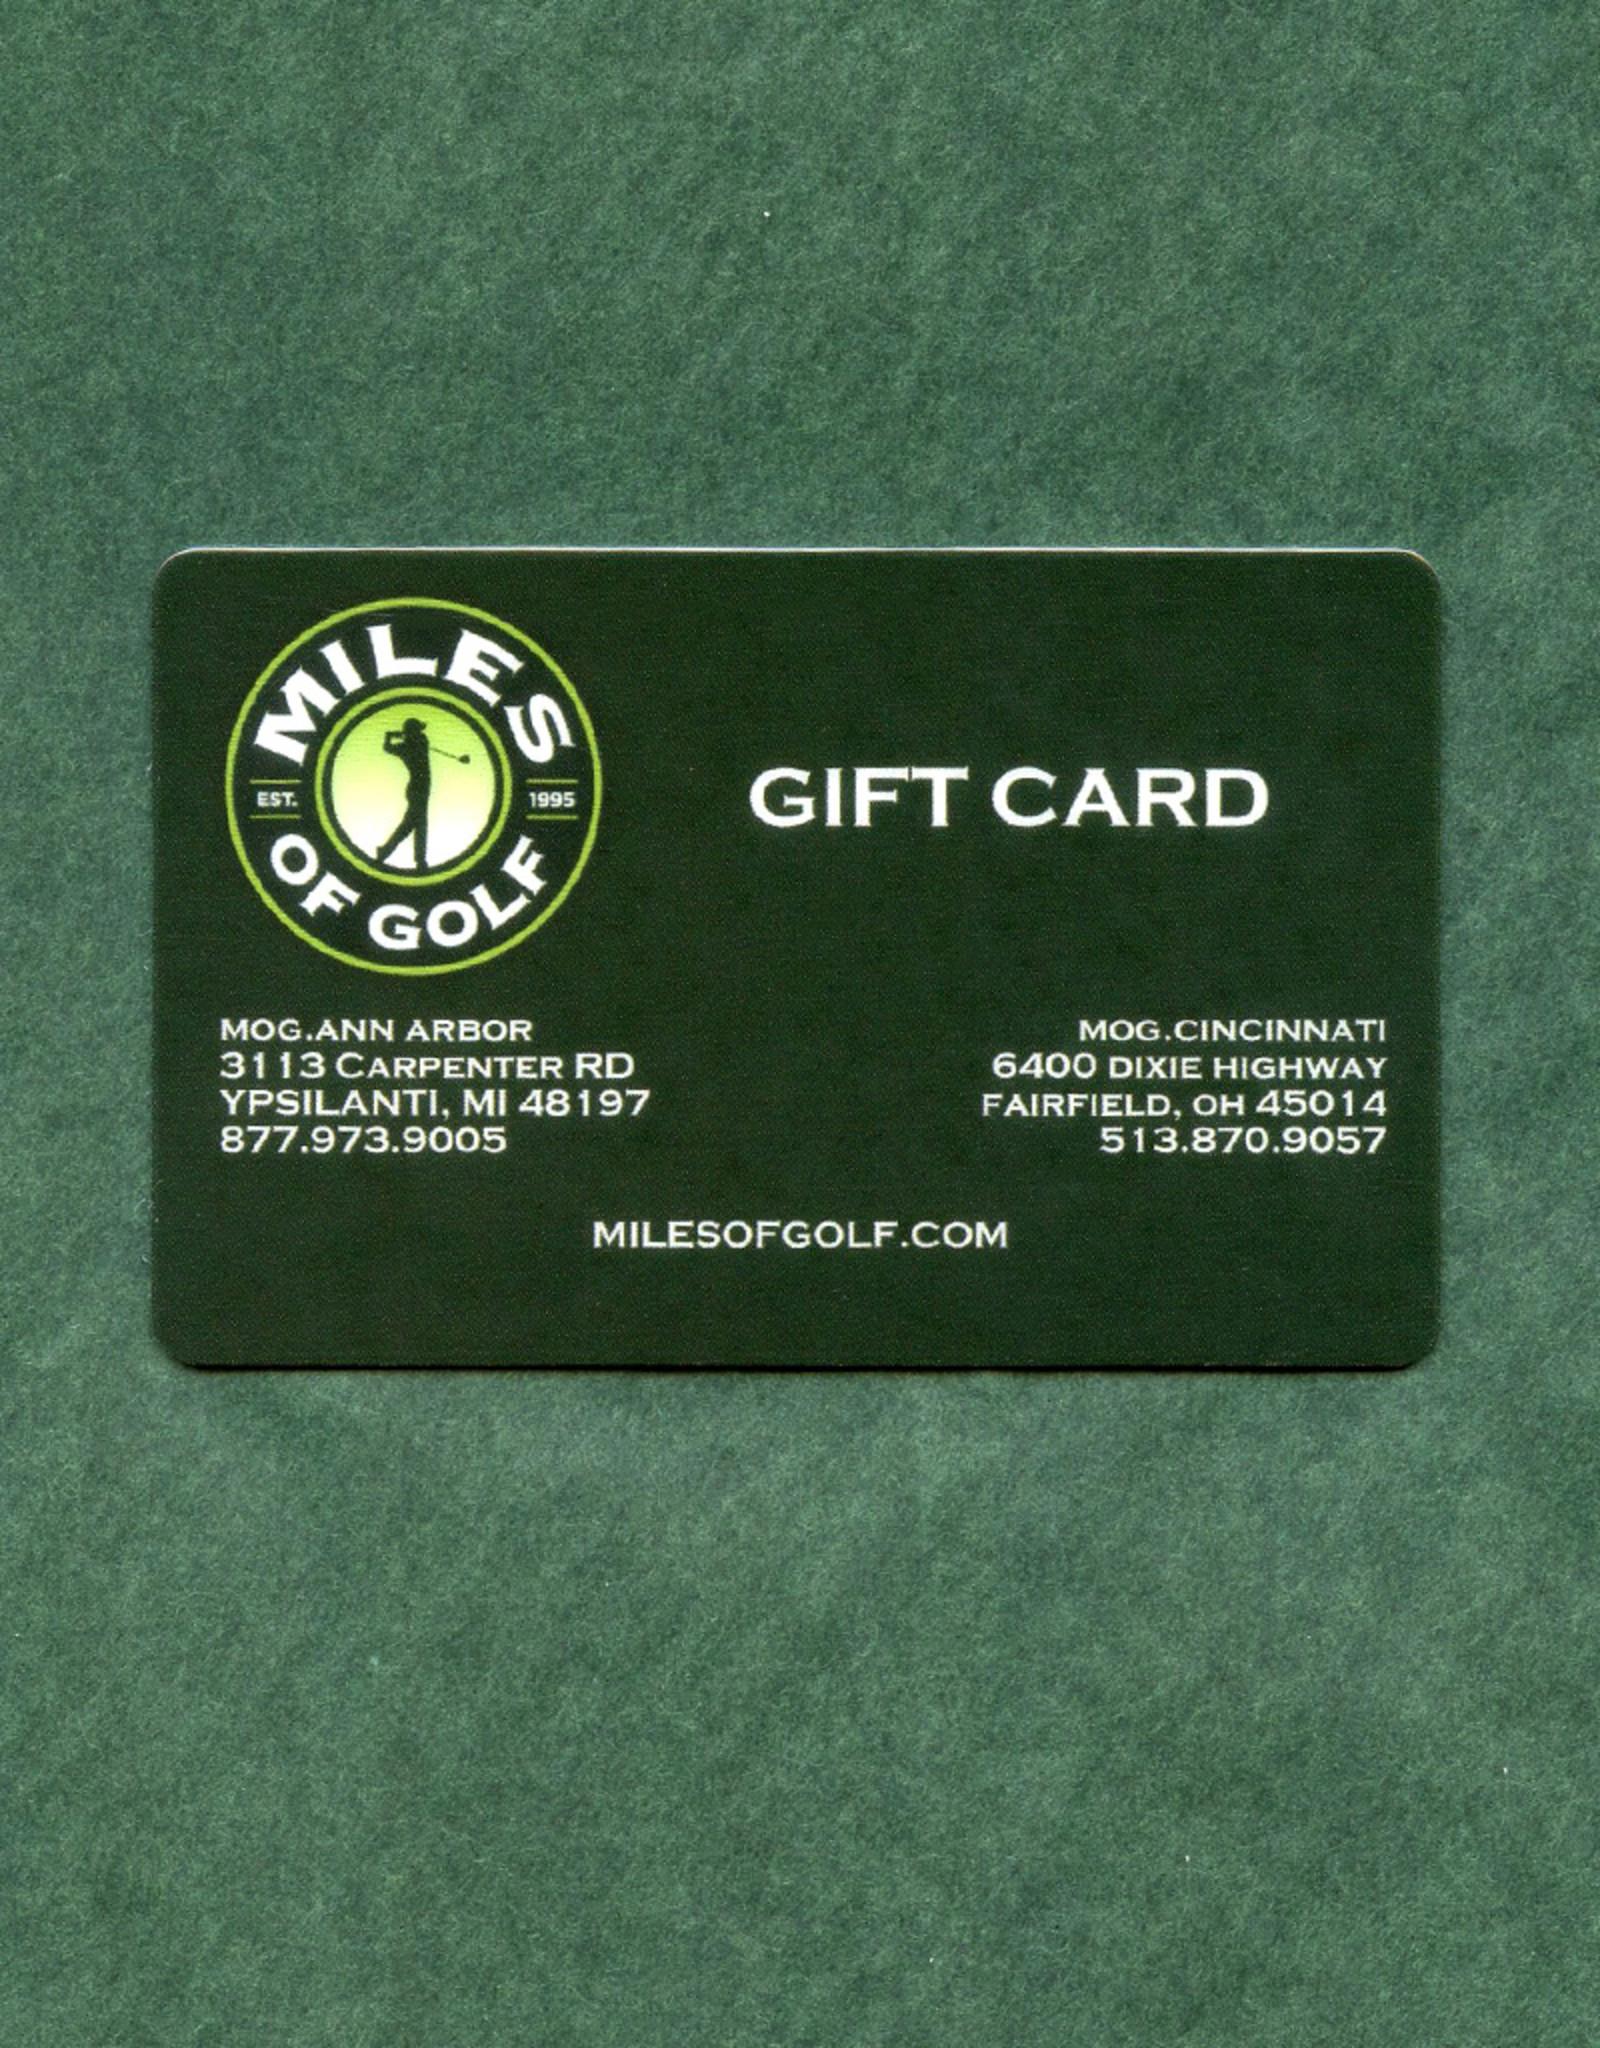 $5,000 GIFT CARD